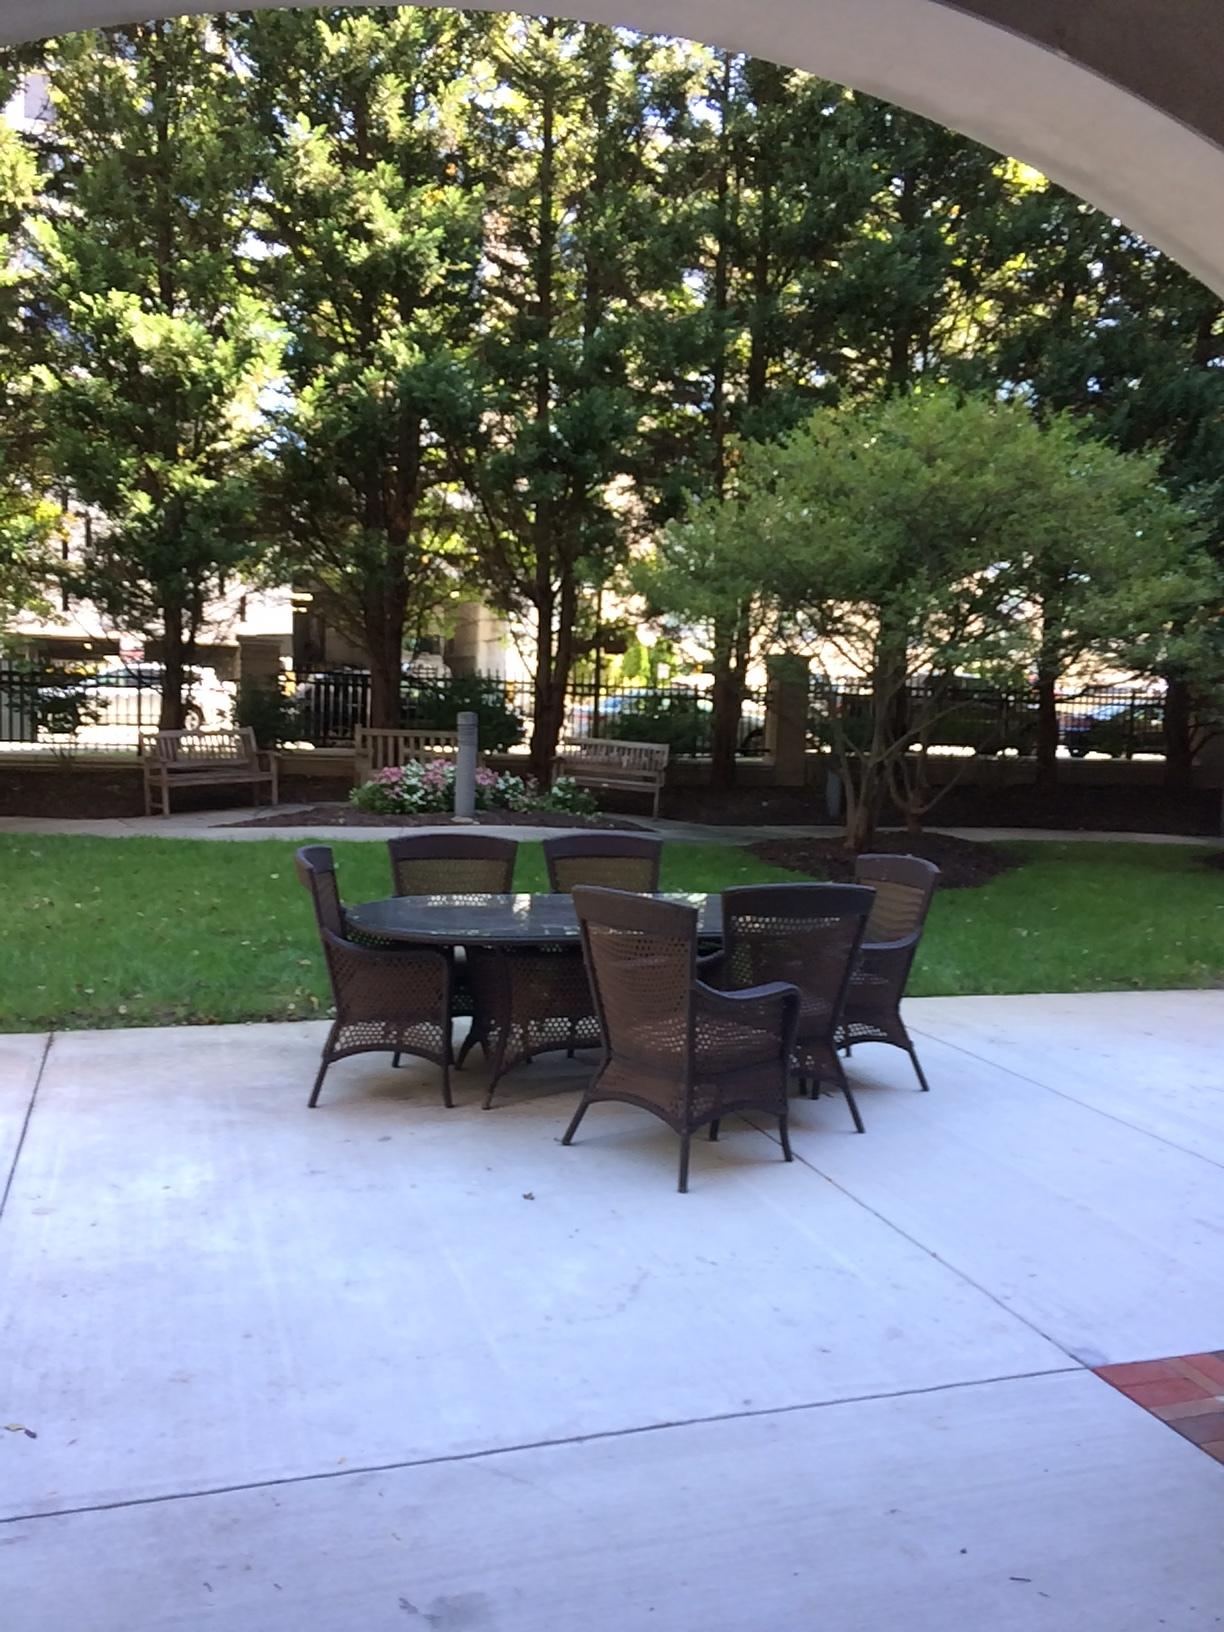 Outdoor seating area at Brighton Gardens